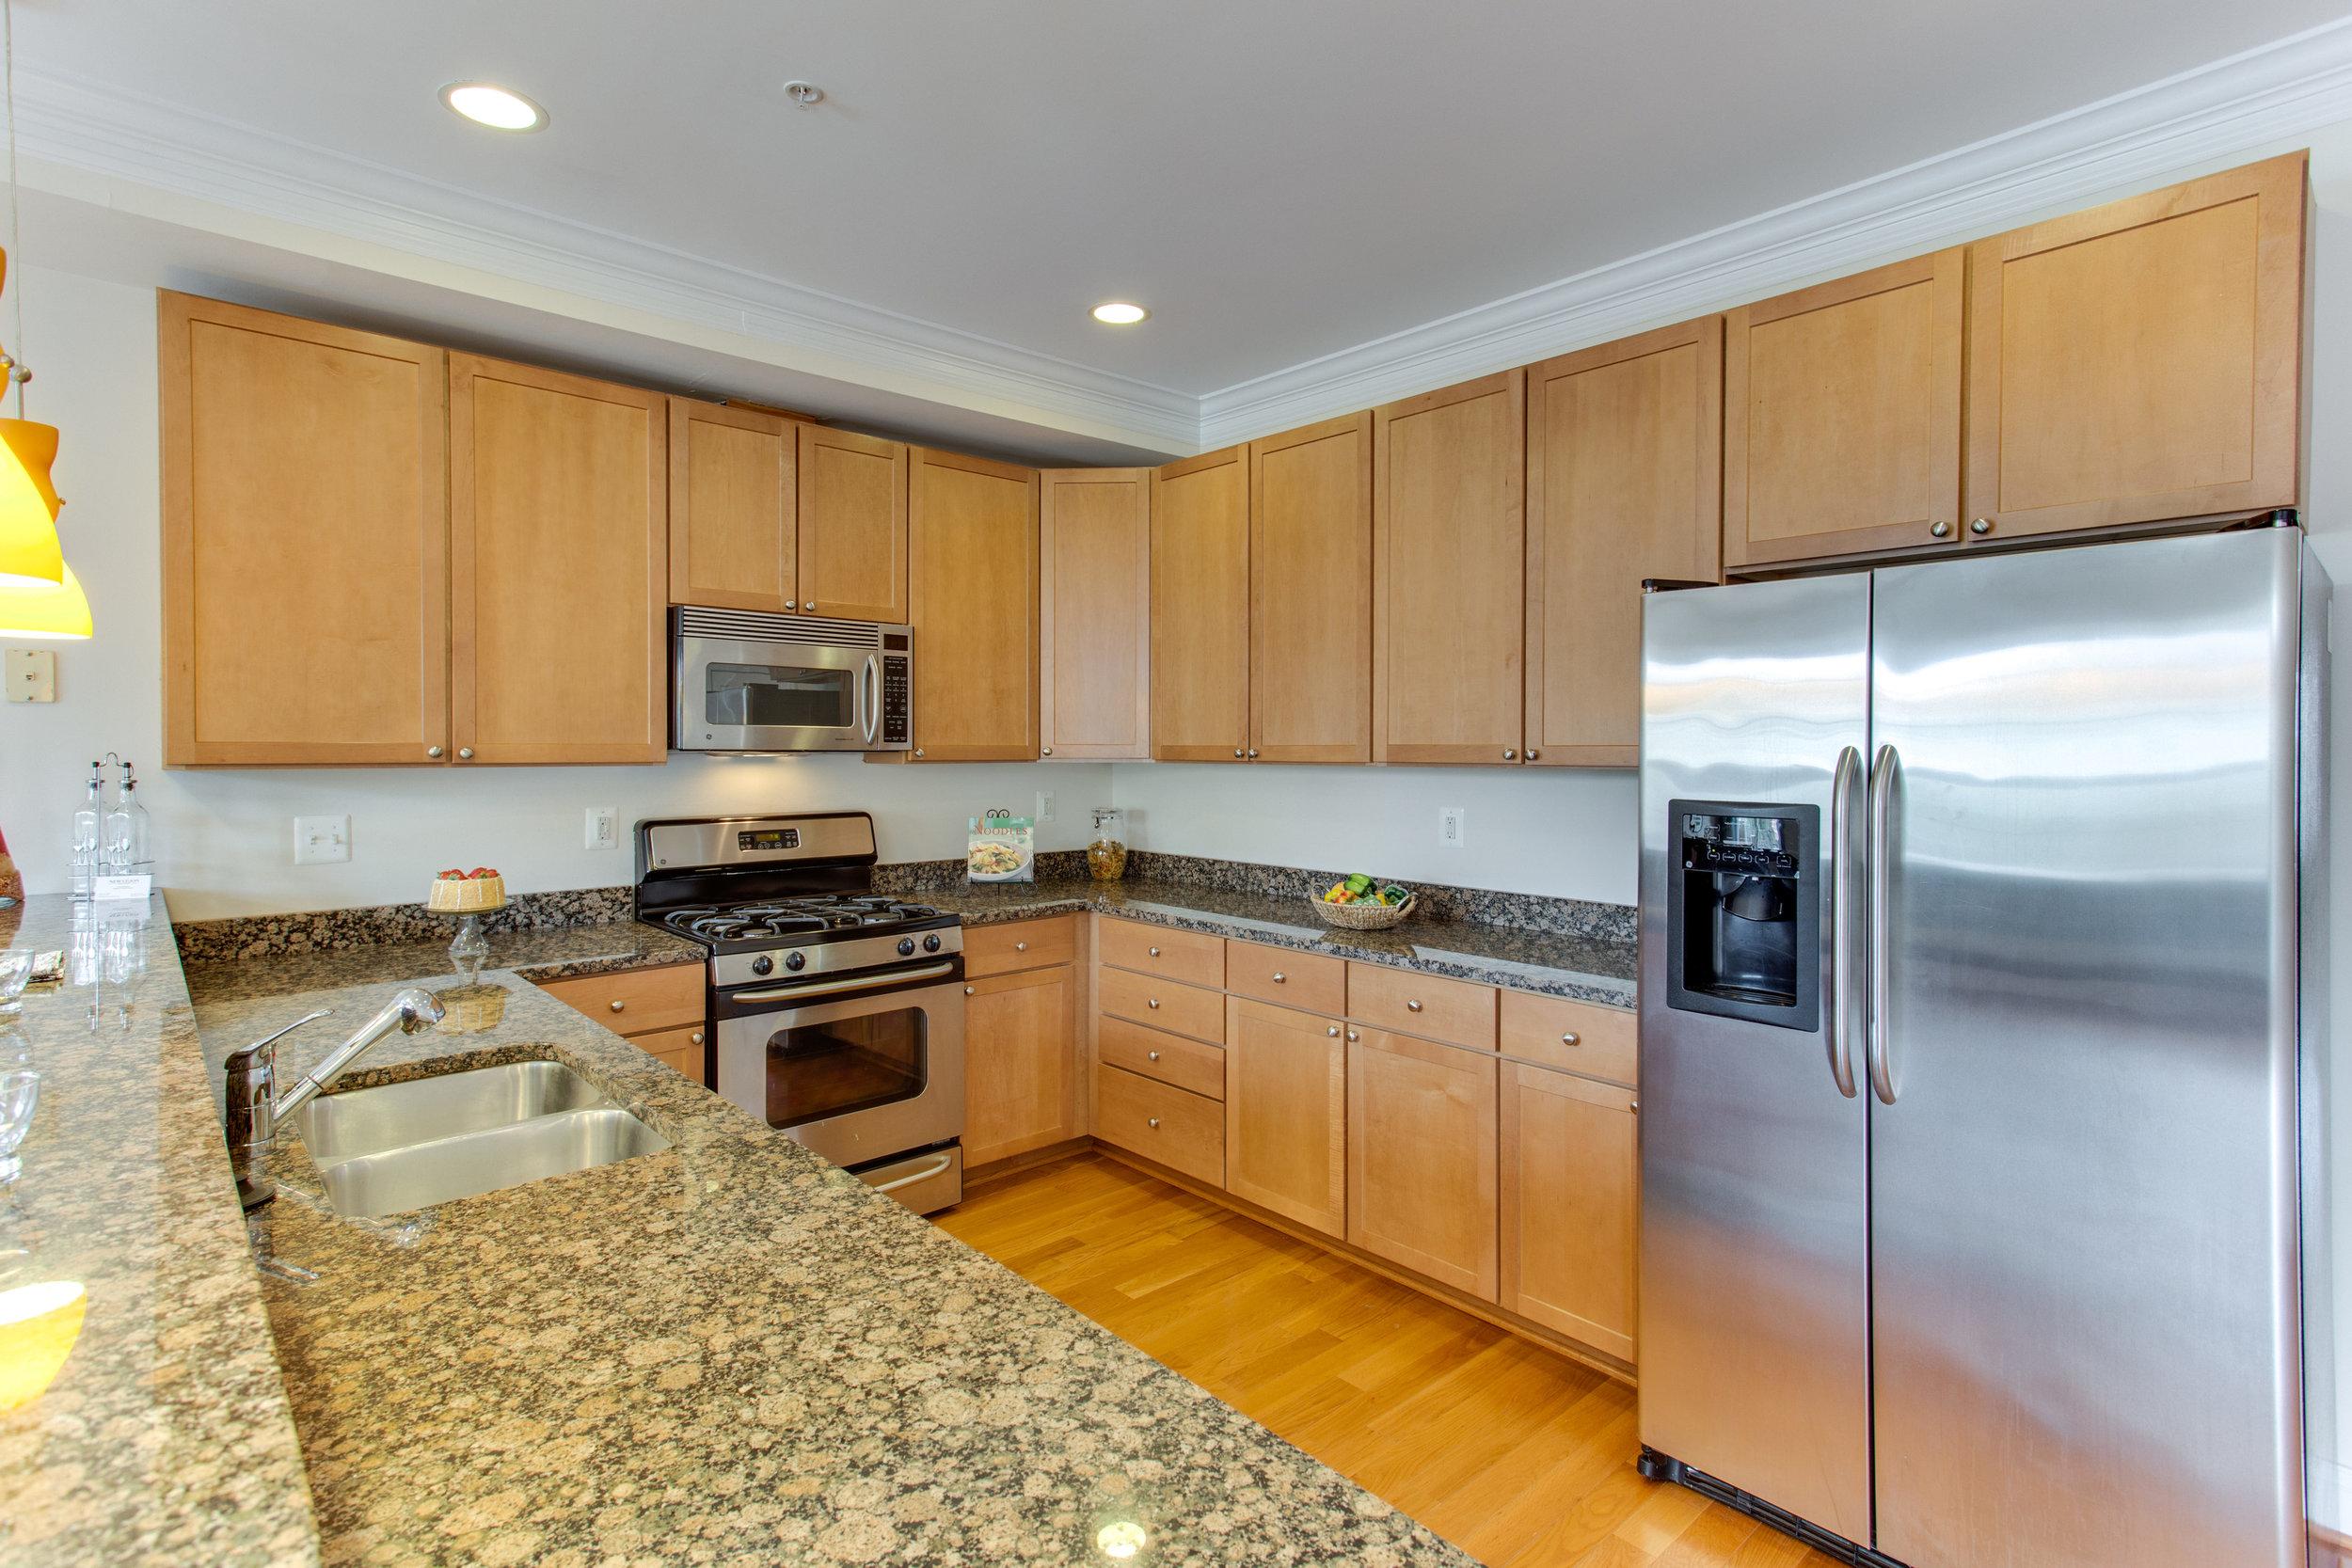 5522 9th St NW Unit 1-print-023-19-Kitchen-4200x2800-300dpi.jpg